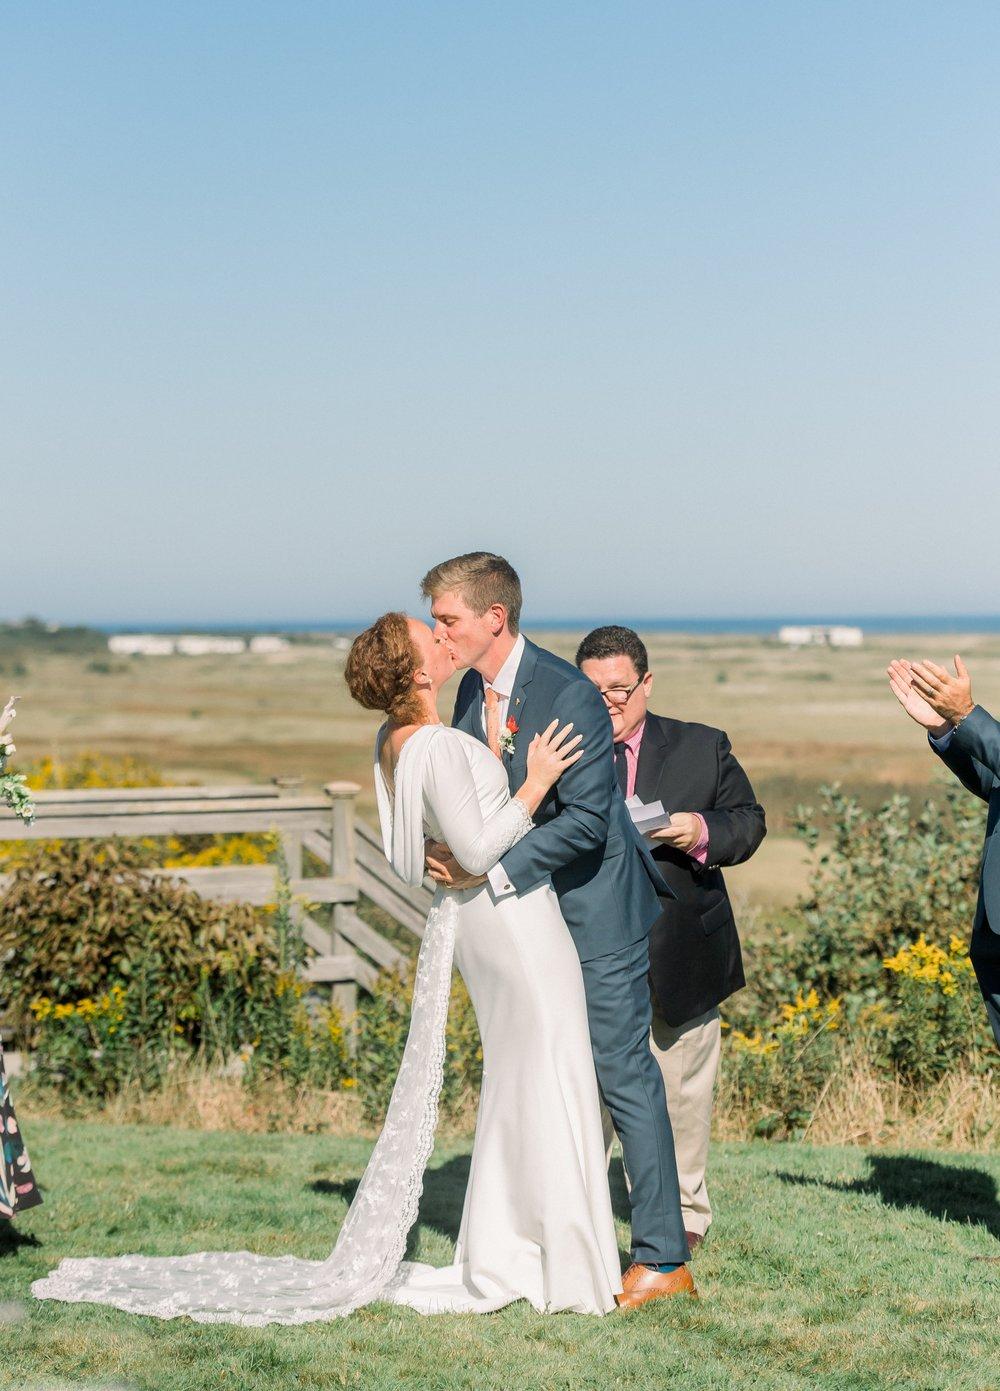 Whit & Rob's Nantucket Wedding-48.jpg